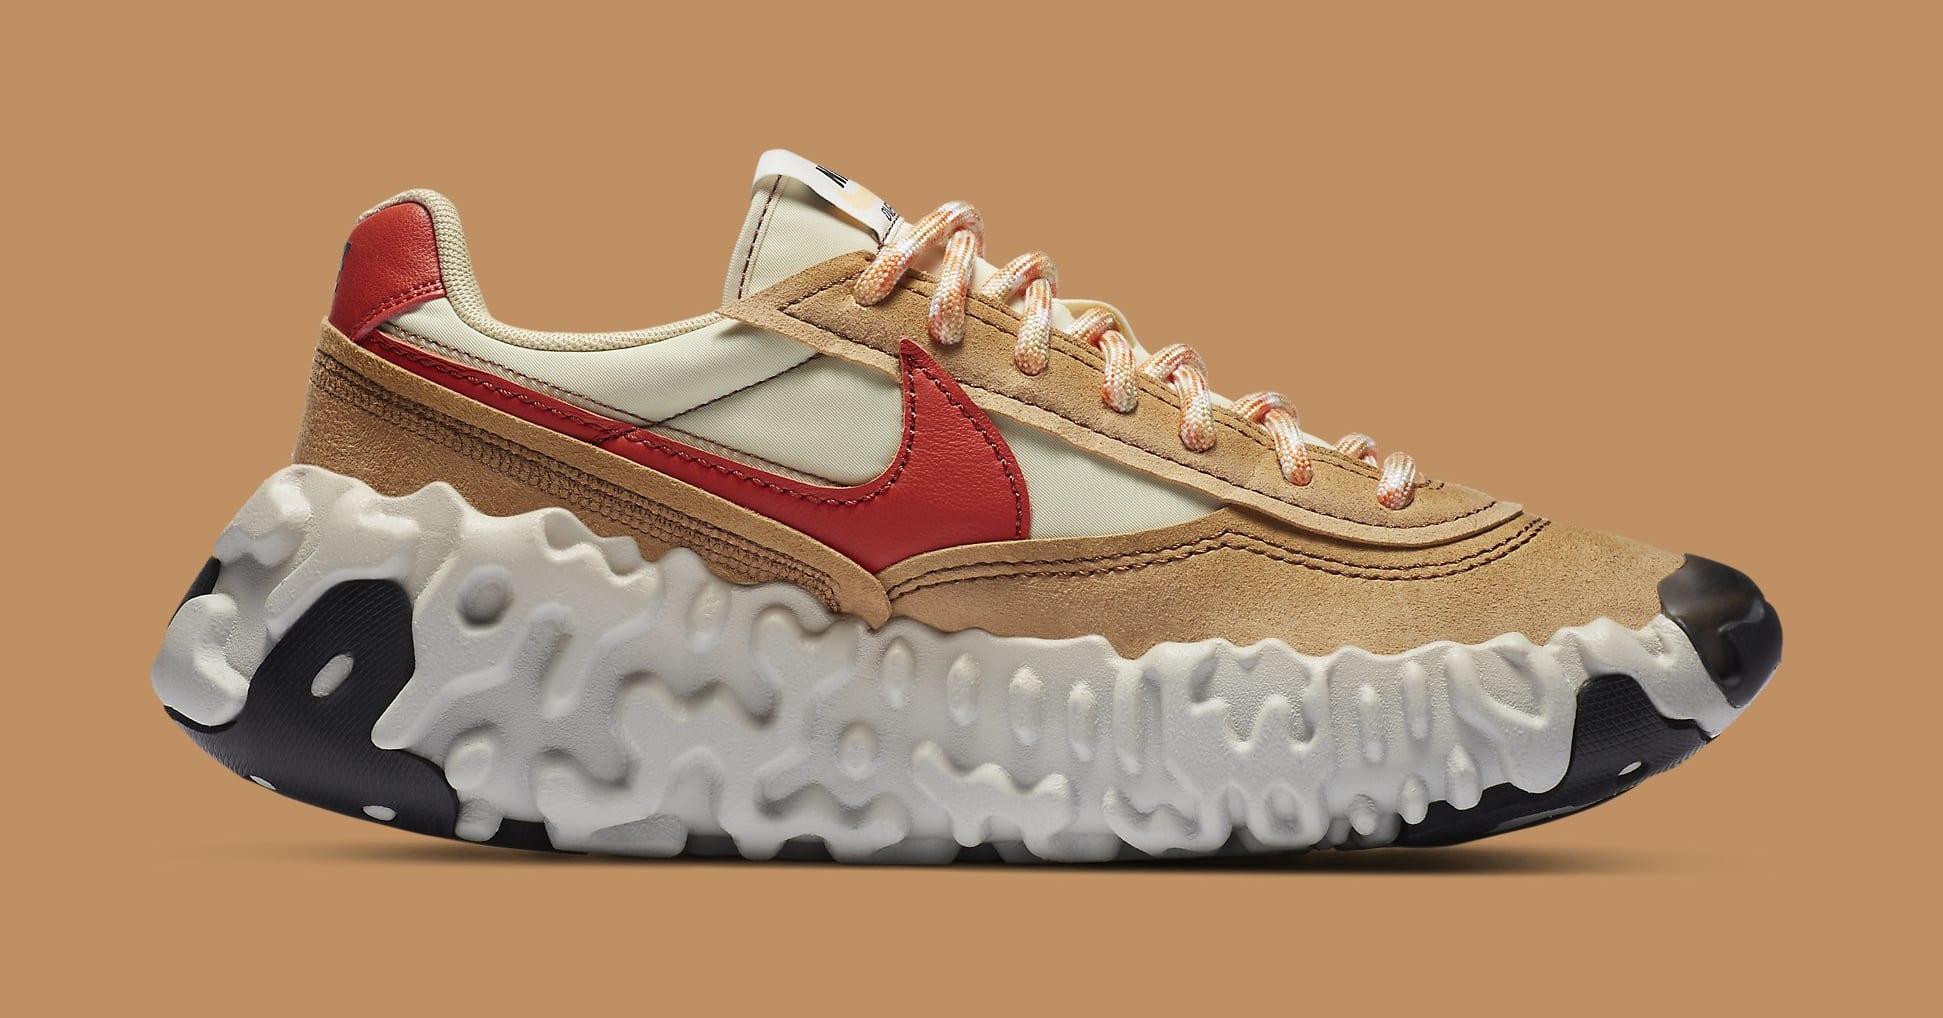 Nike OverBreak 'Mars Yard' DA9784-700 Lateral